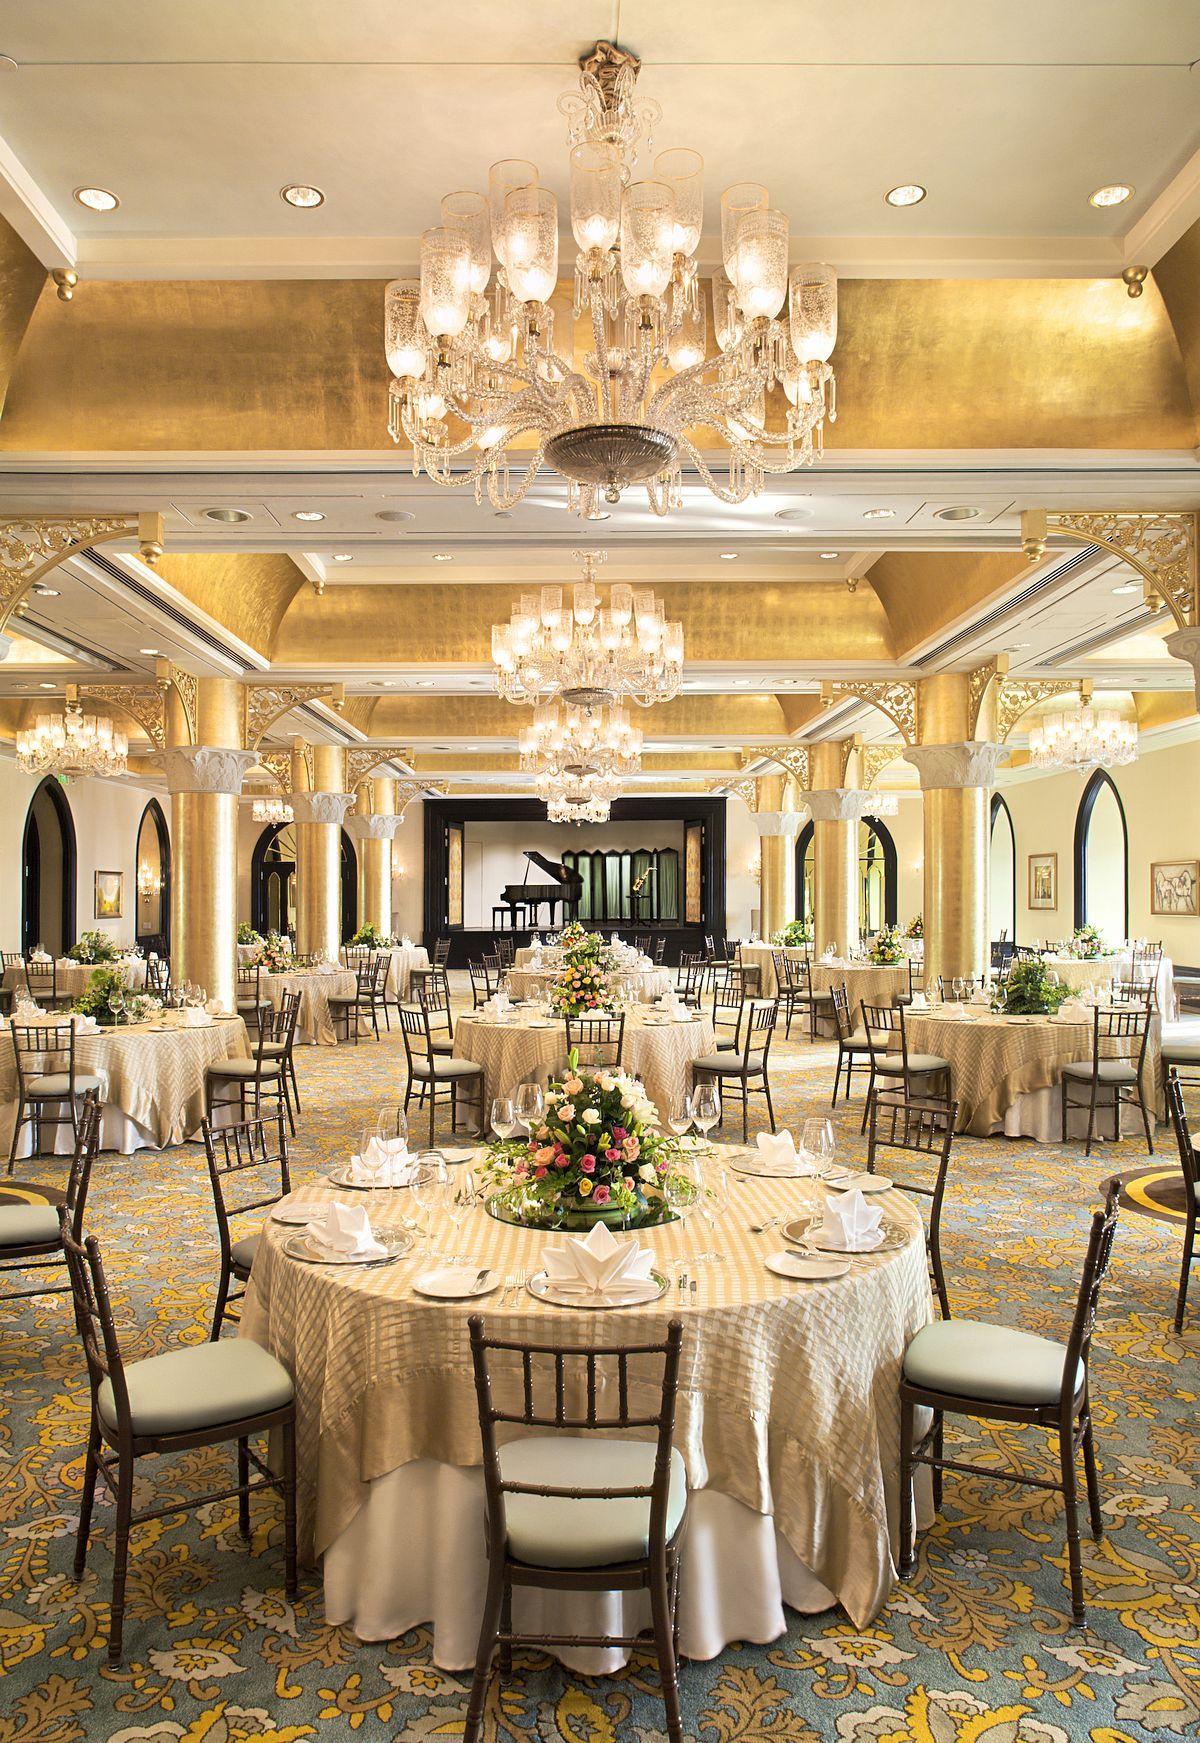 Exotic Hotel Rooms: The Taj Mahal Palace, Mumbai - India Widely...